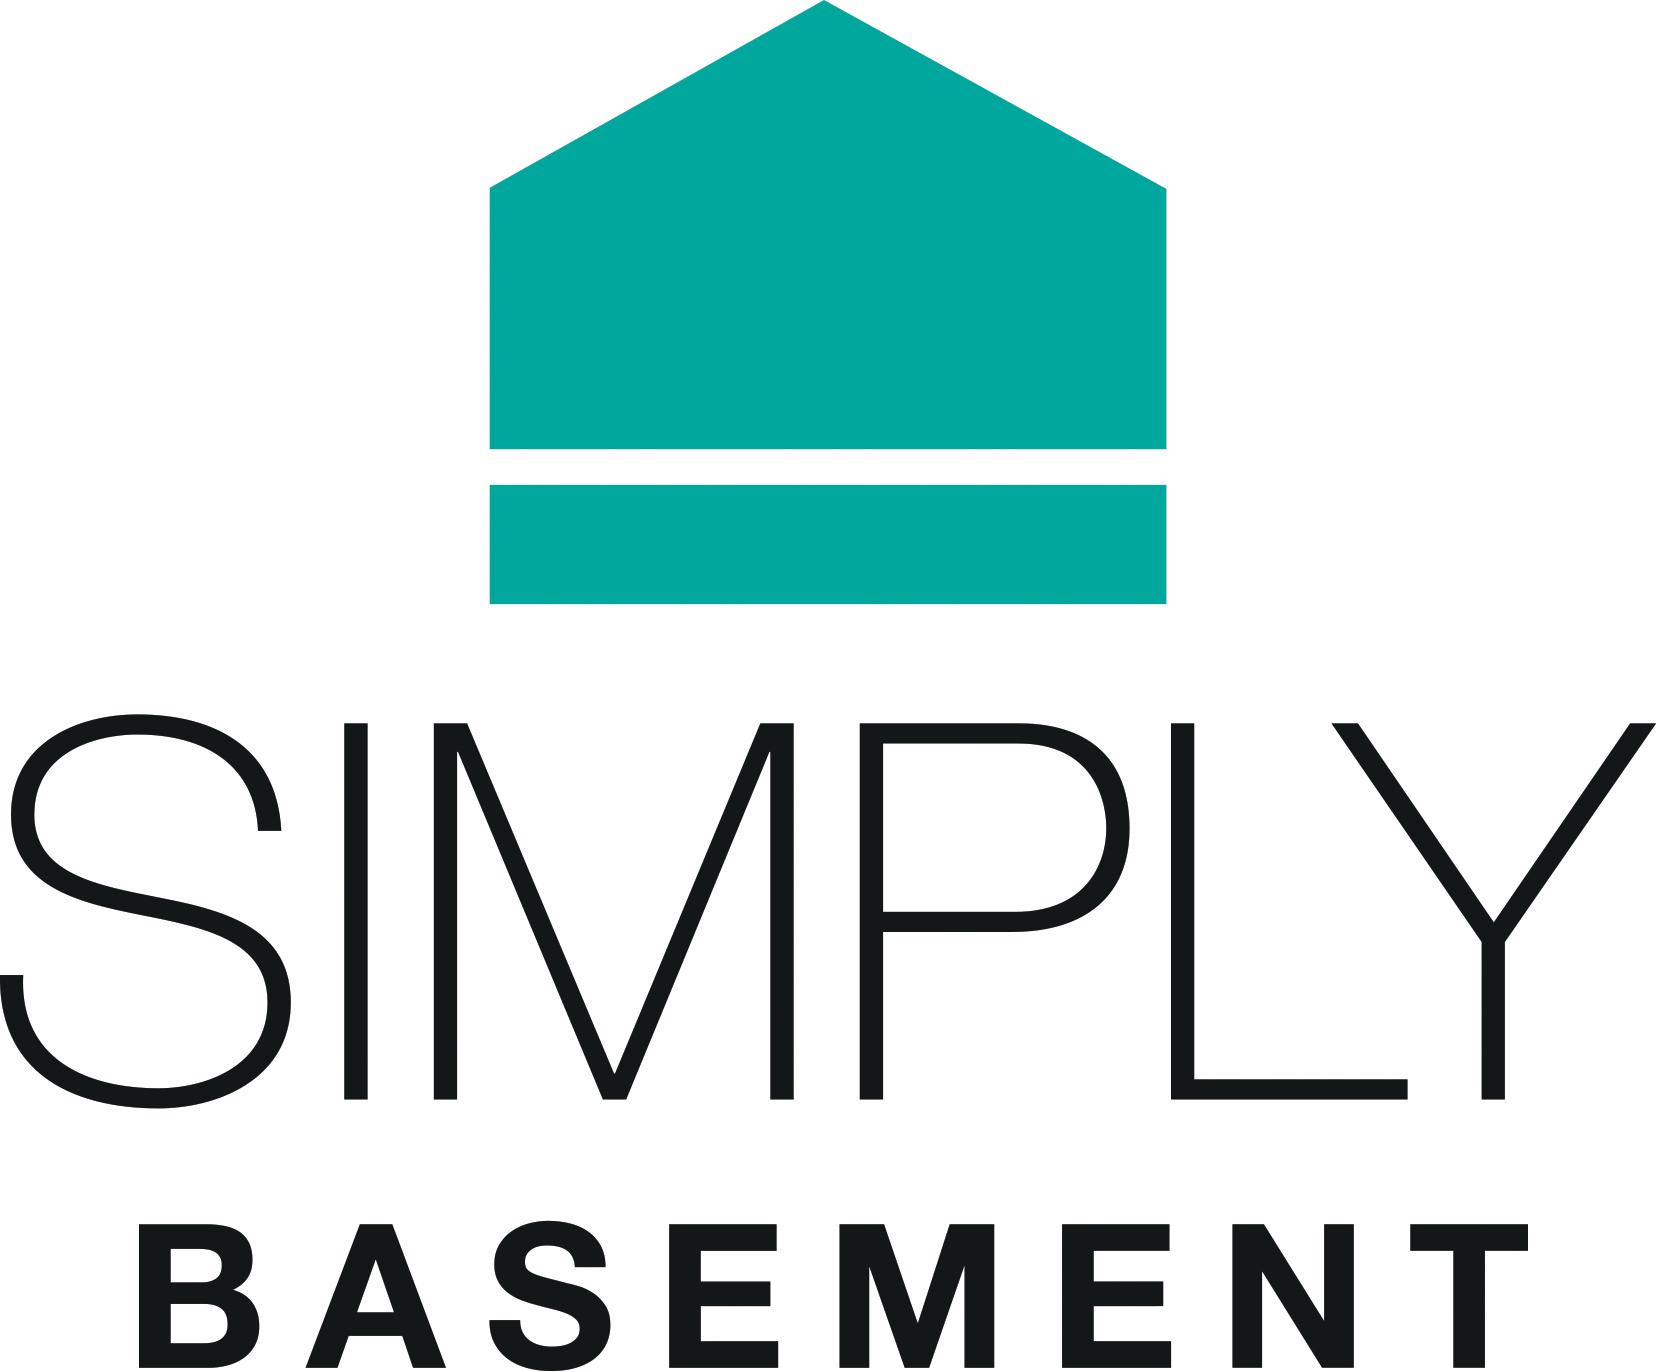 London basement conversions